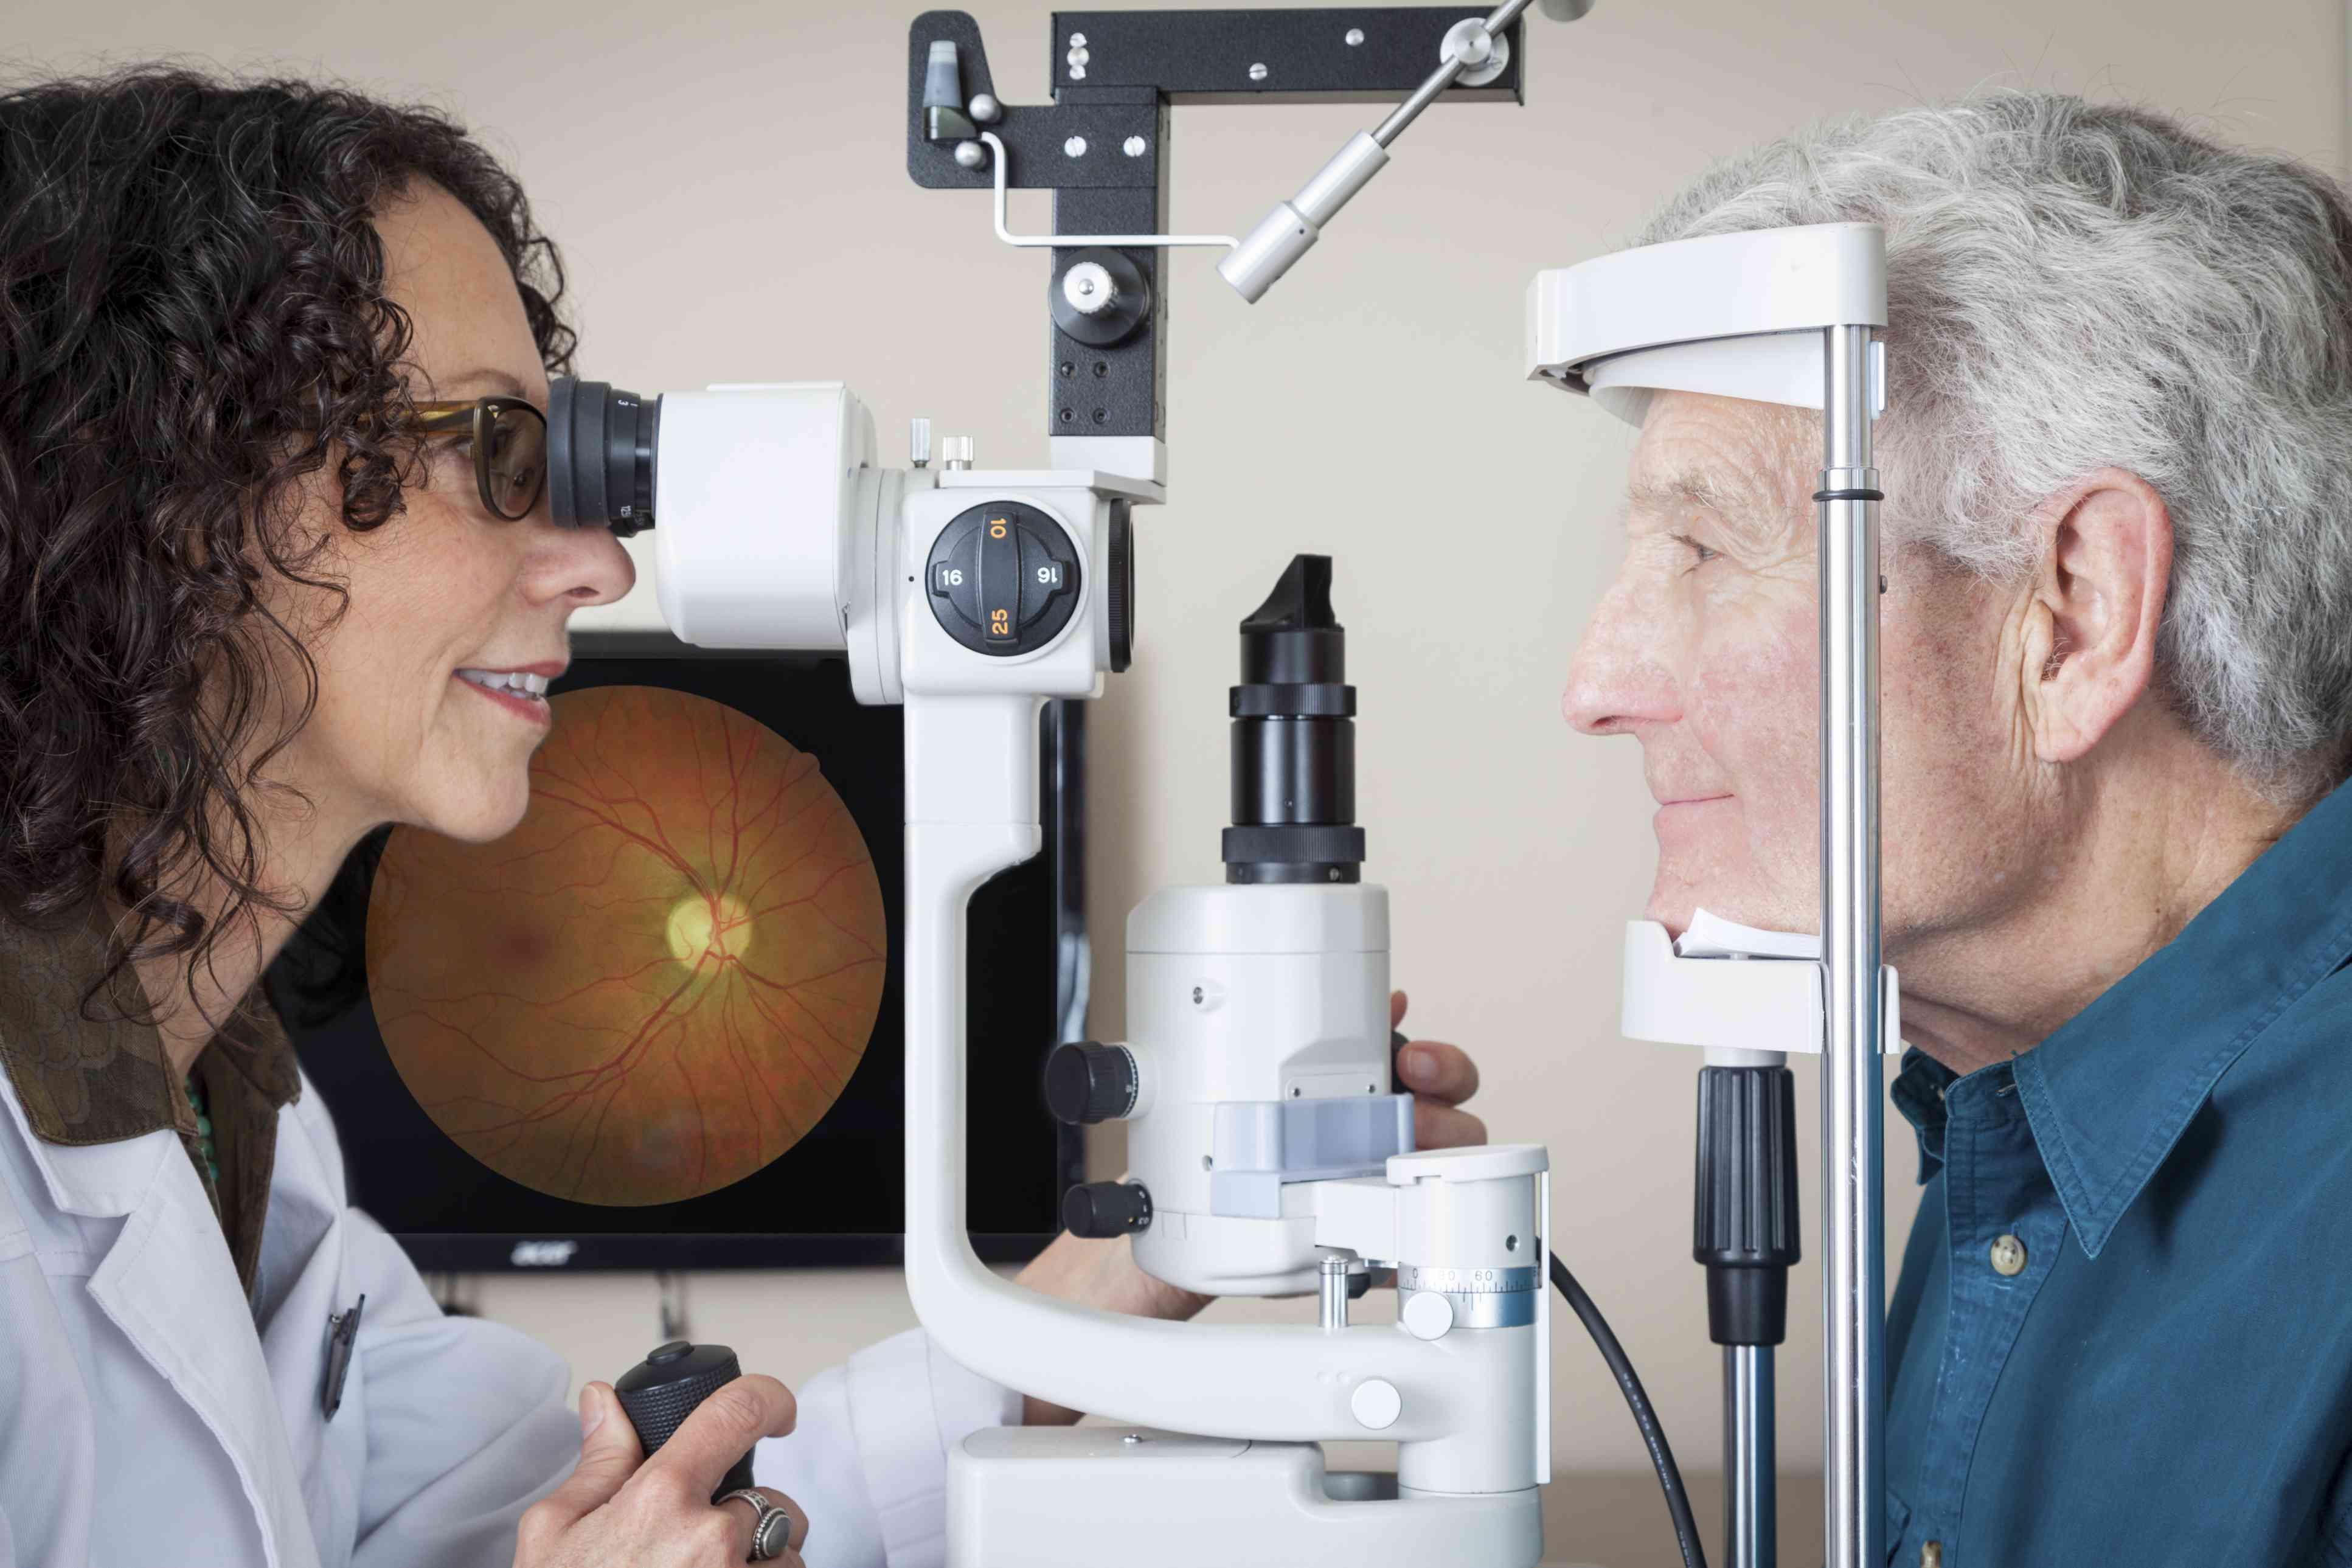 Doctor performing eye exam on elderly man